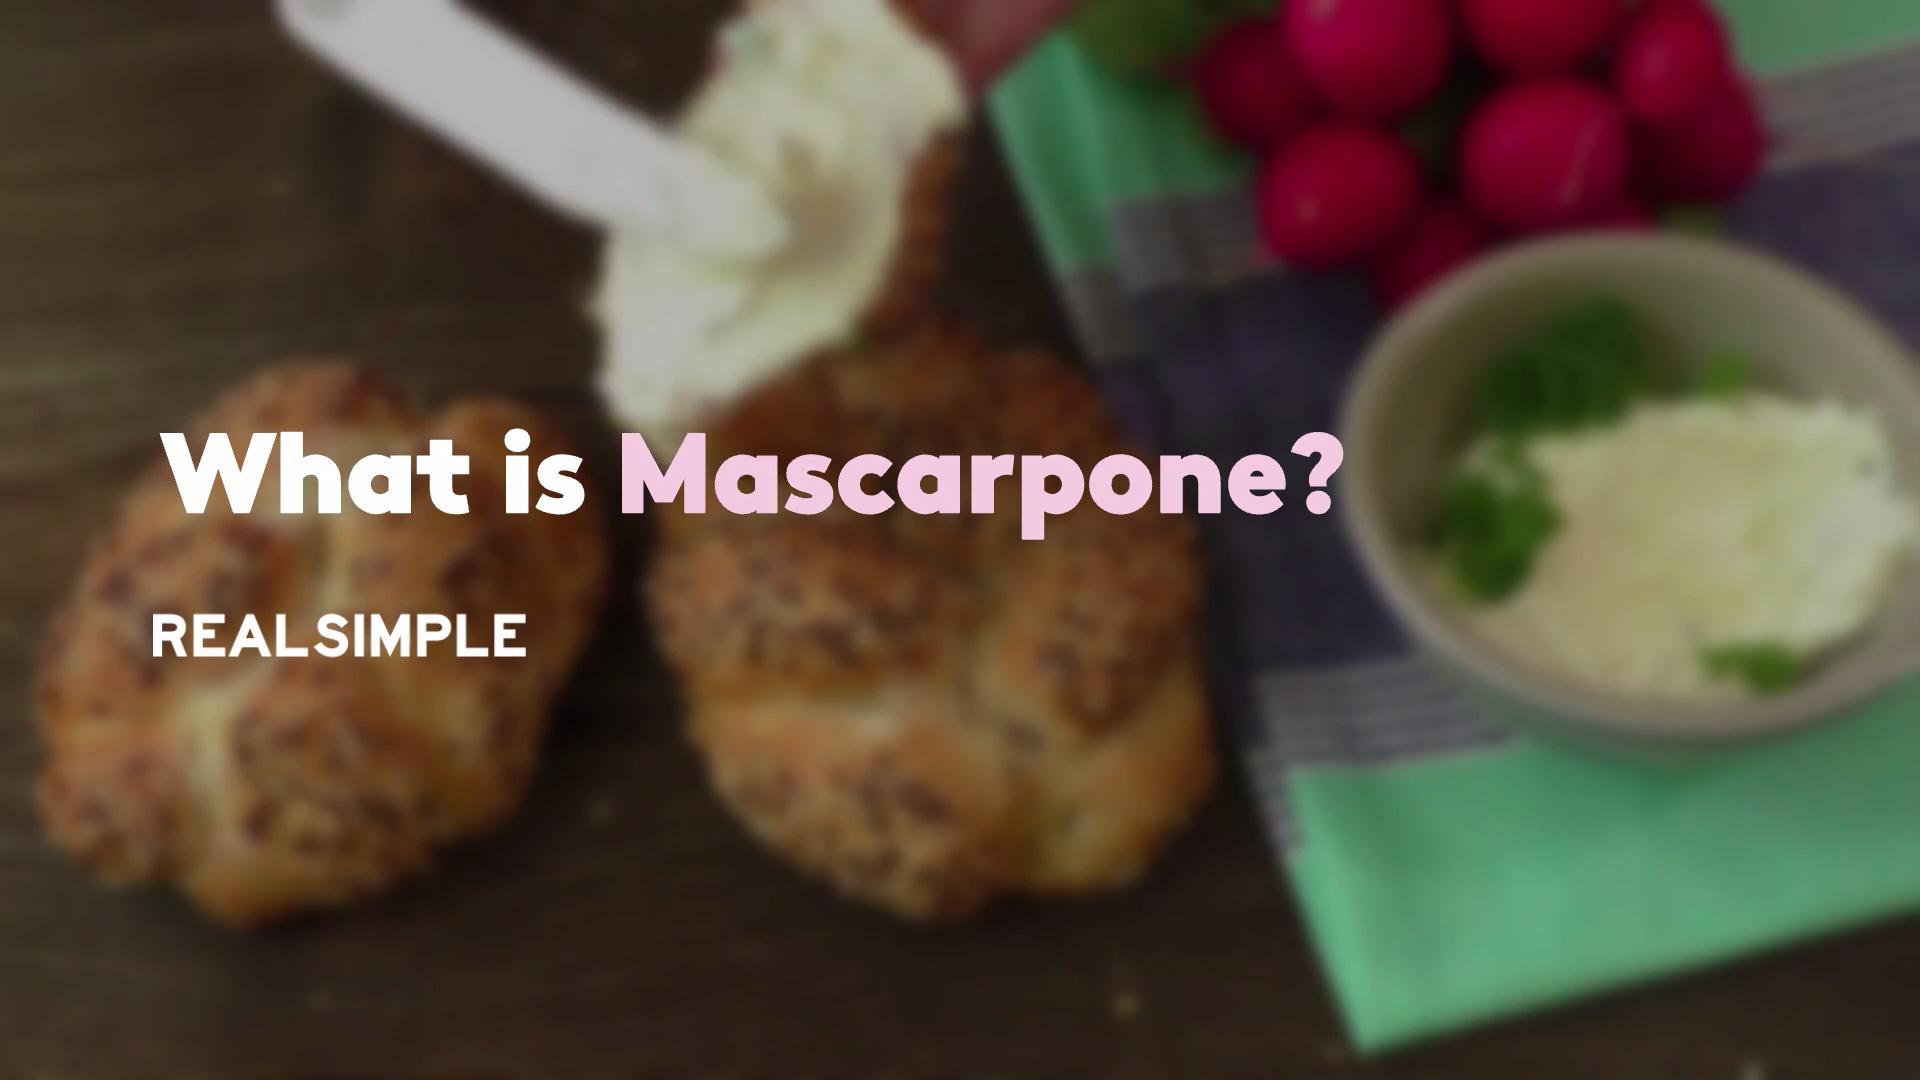 What is Mascarpone?